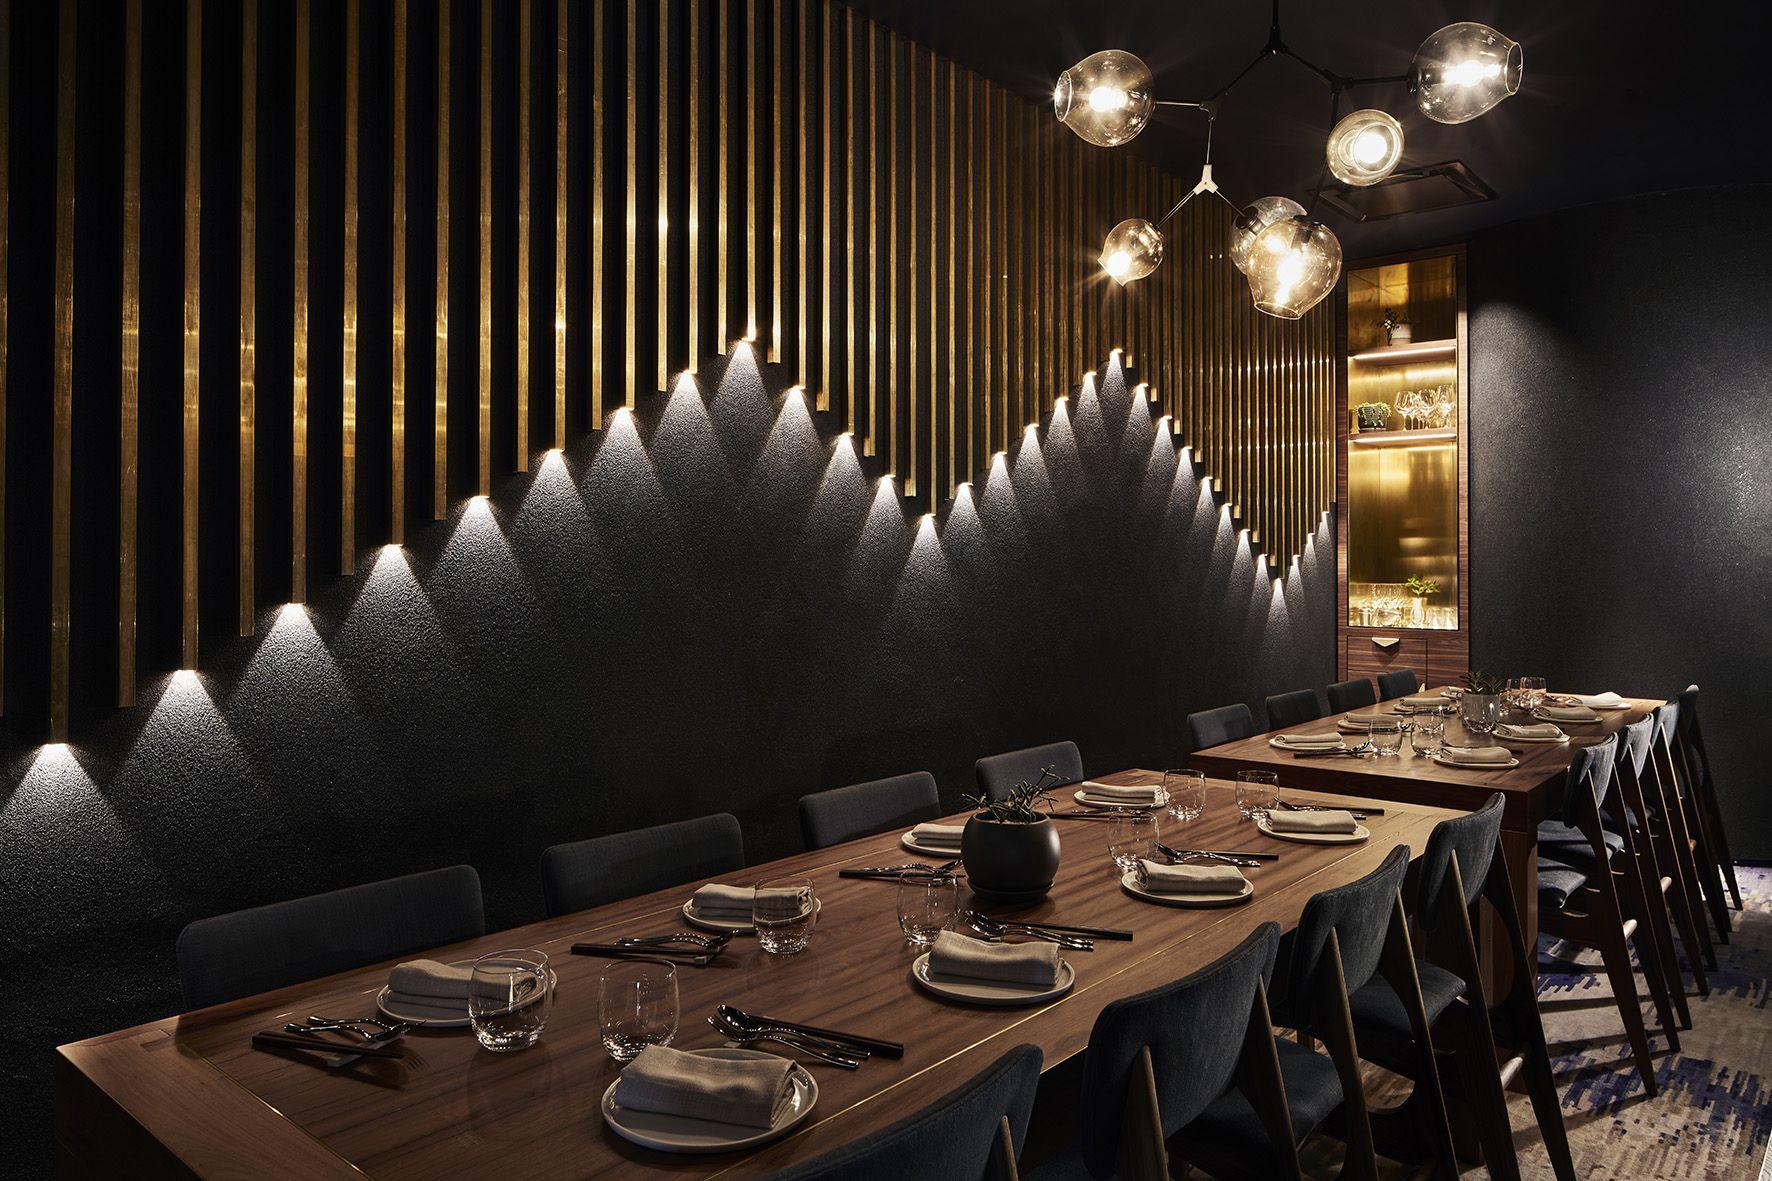 Private Dining Room 1 At Fujisaki Barangaroo Sydney Designed By